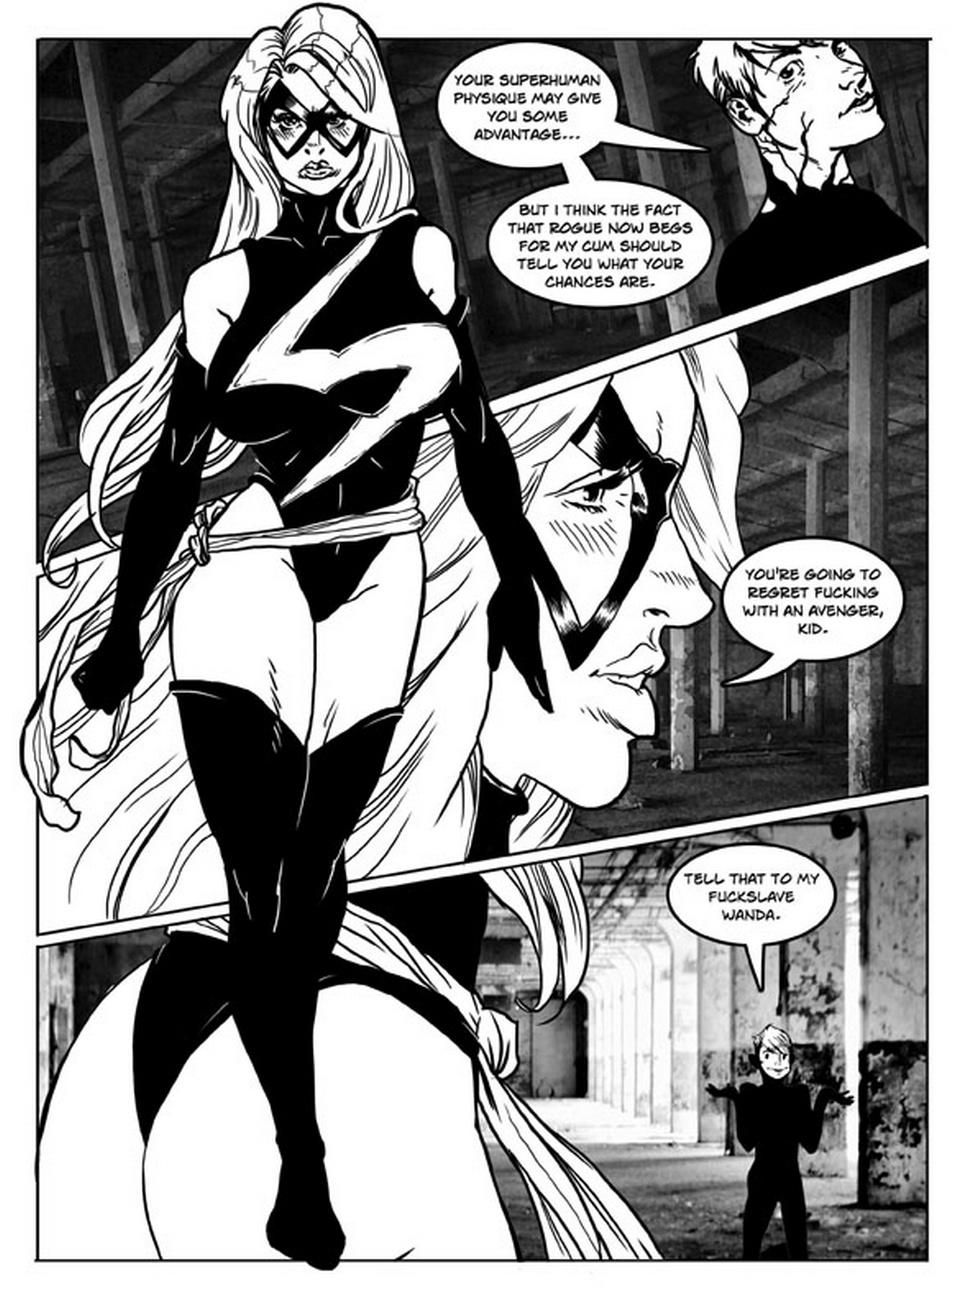 Submission Agenda 10 - Ms Marvel